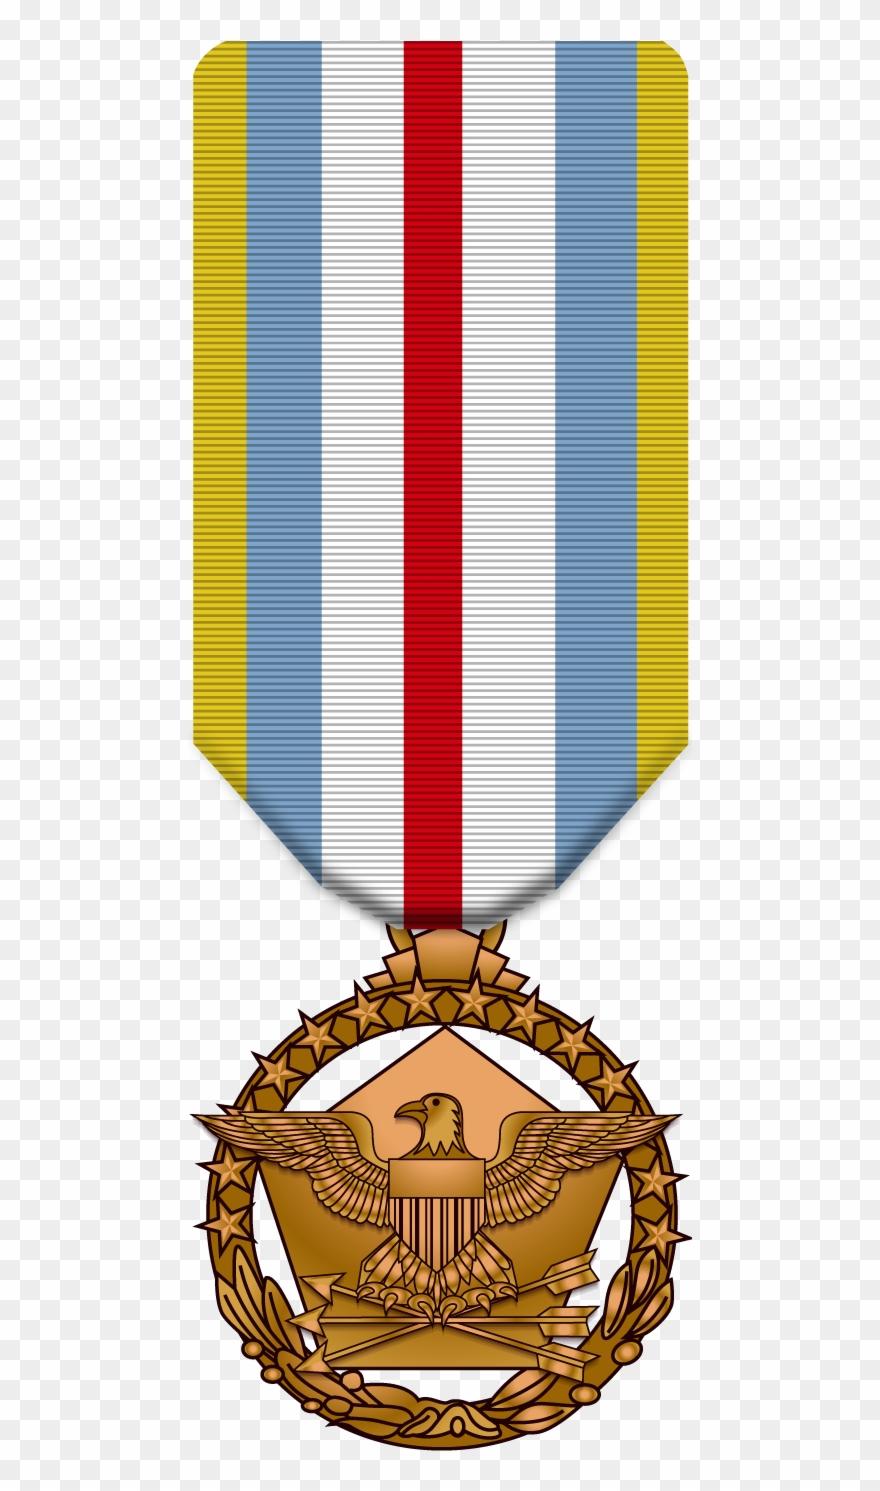 Defense Superior Service Military Medal.